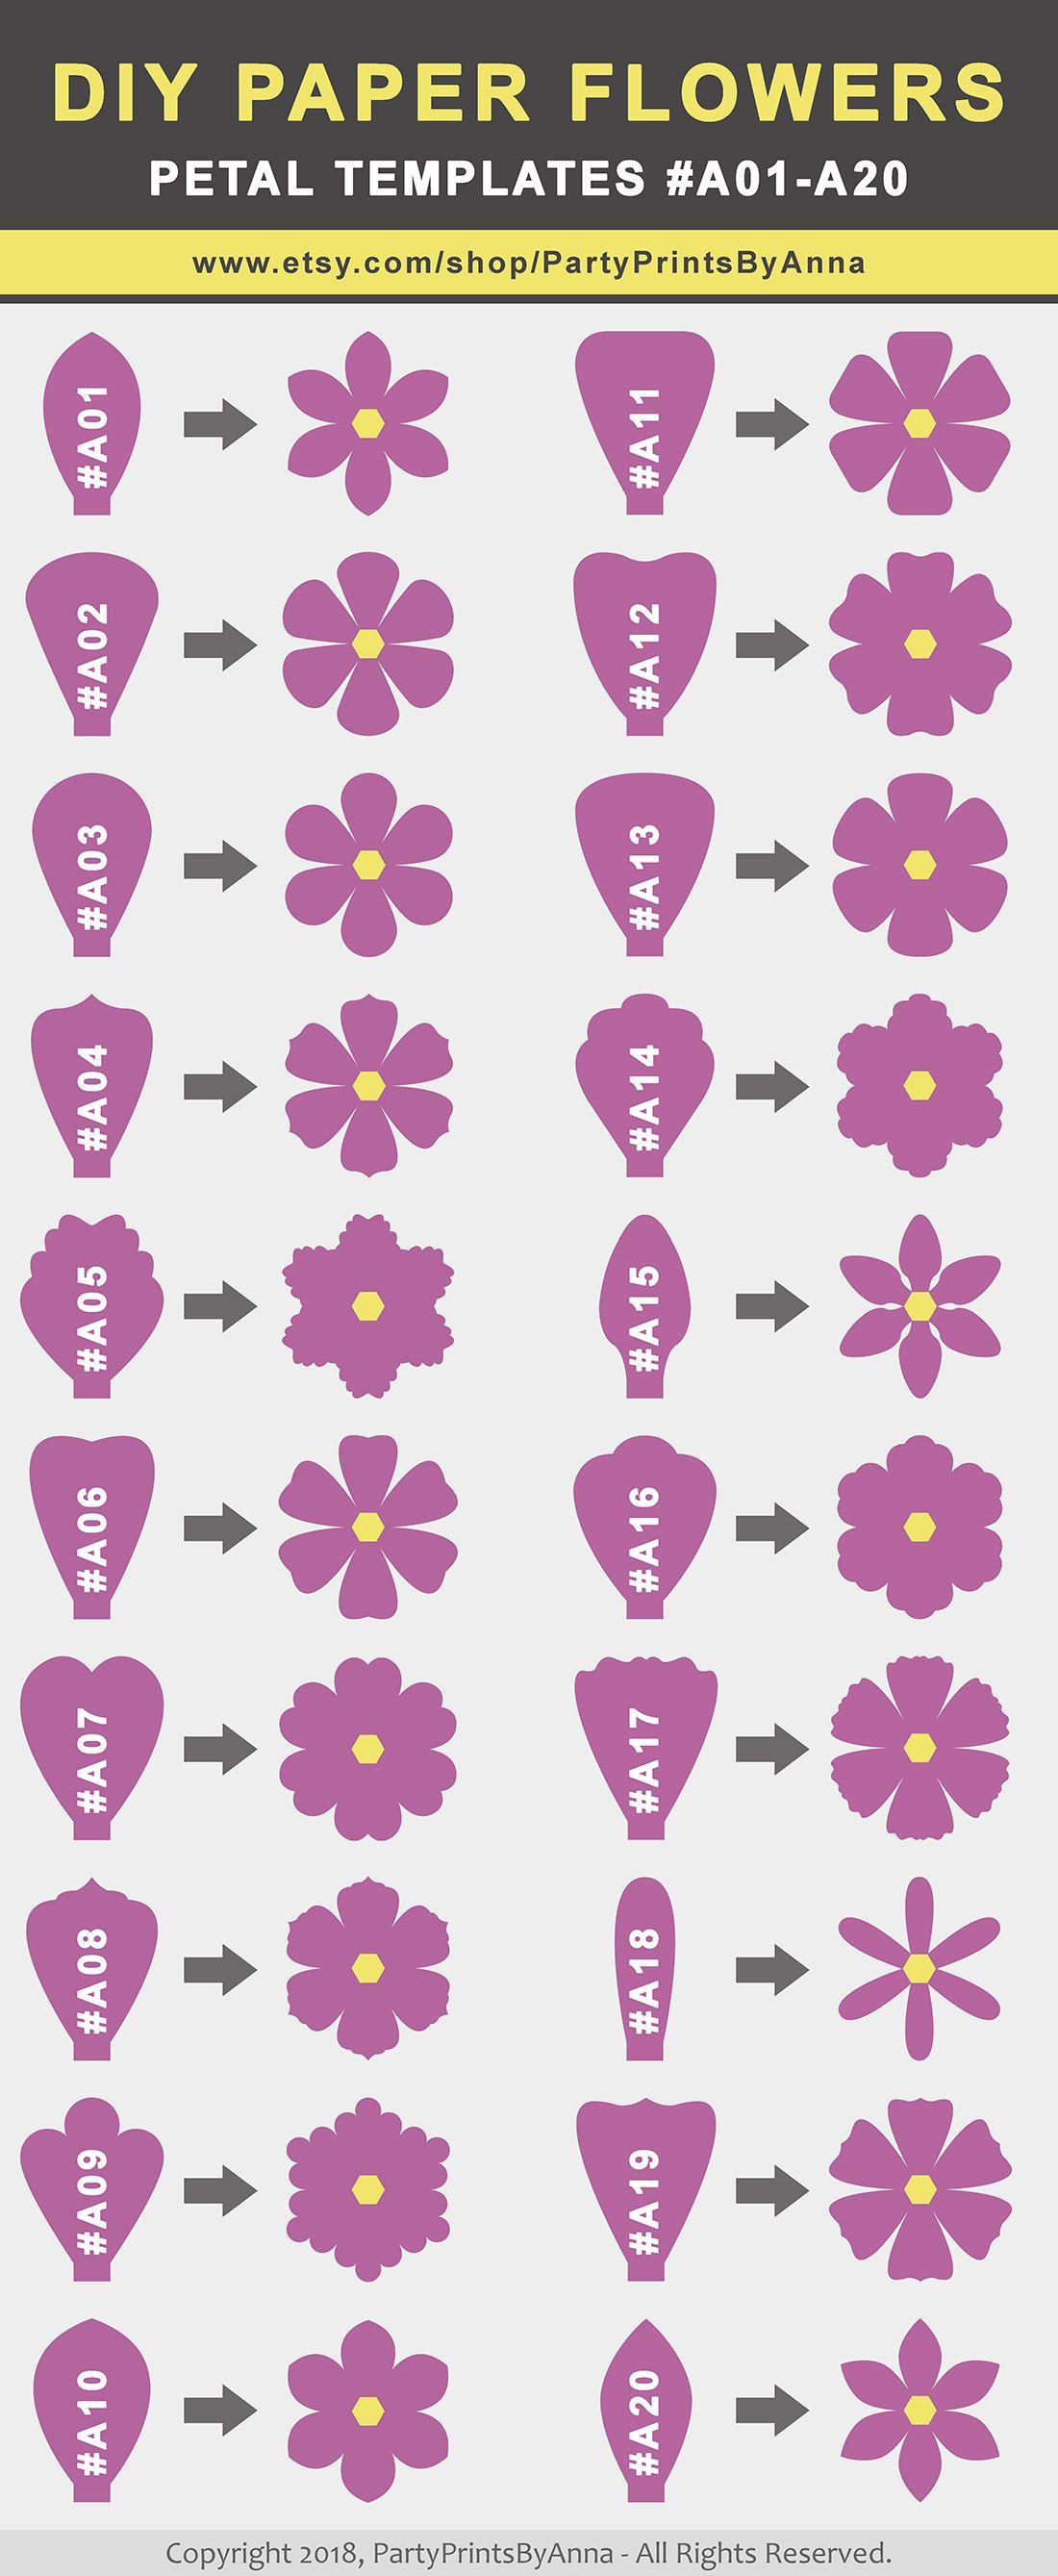 40 Svg Paper Flower Templates Petal Templates A01 A40diy Giant